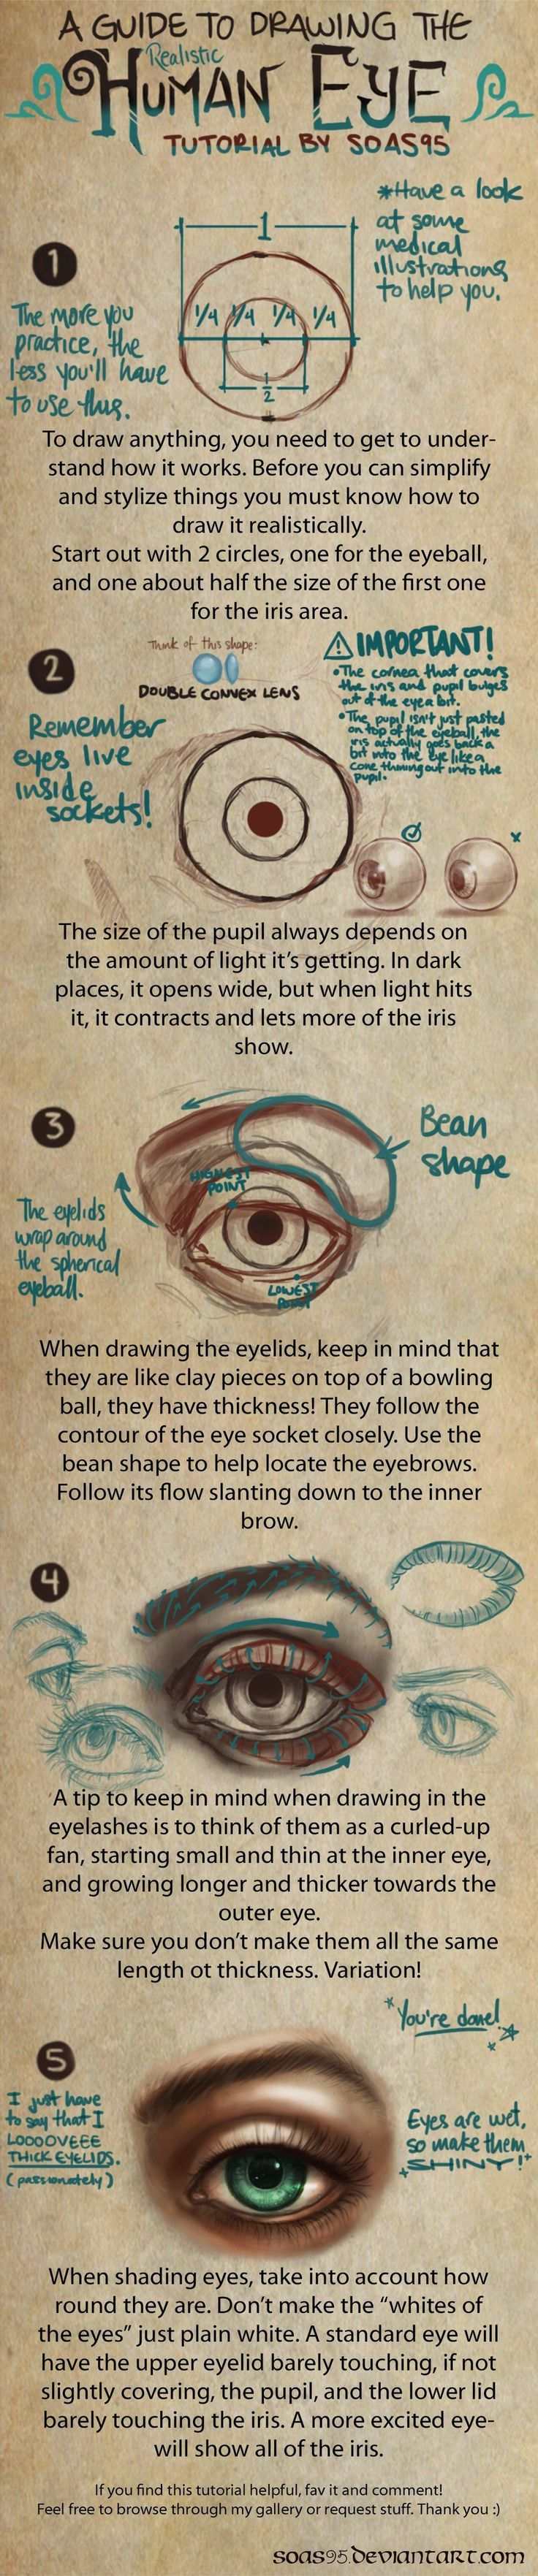 Human Eye- TUTORIAL by *soas95 on deviantART http://soas95.deviantart.com/art/Human-Eye-TUTORIAL-392610867: